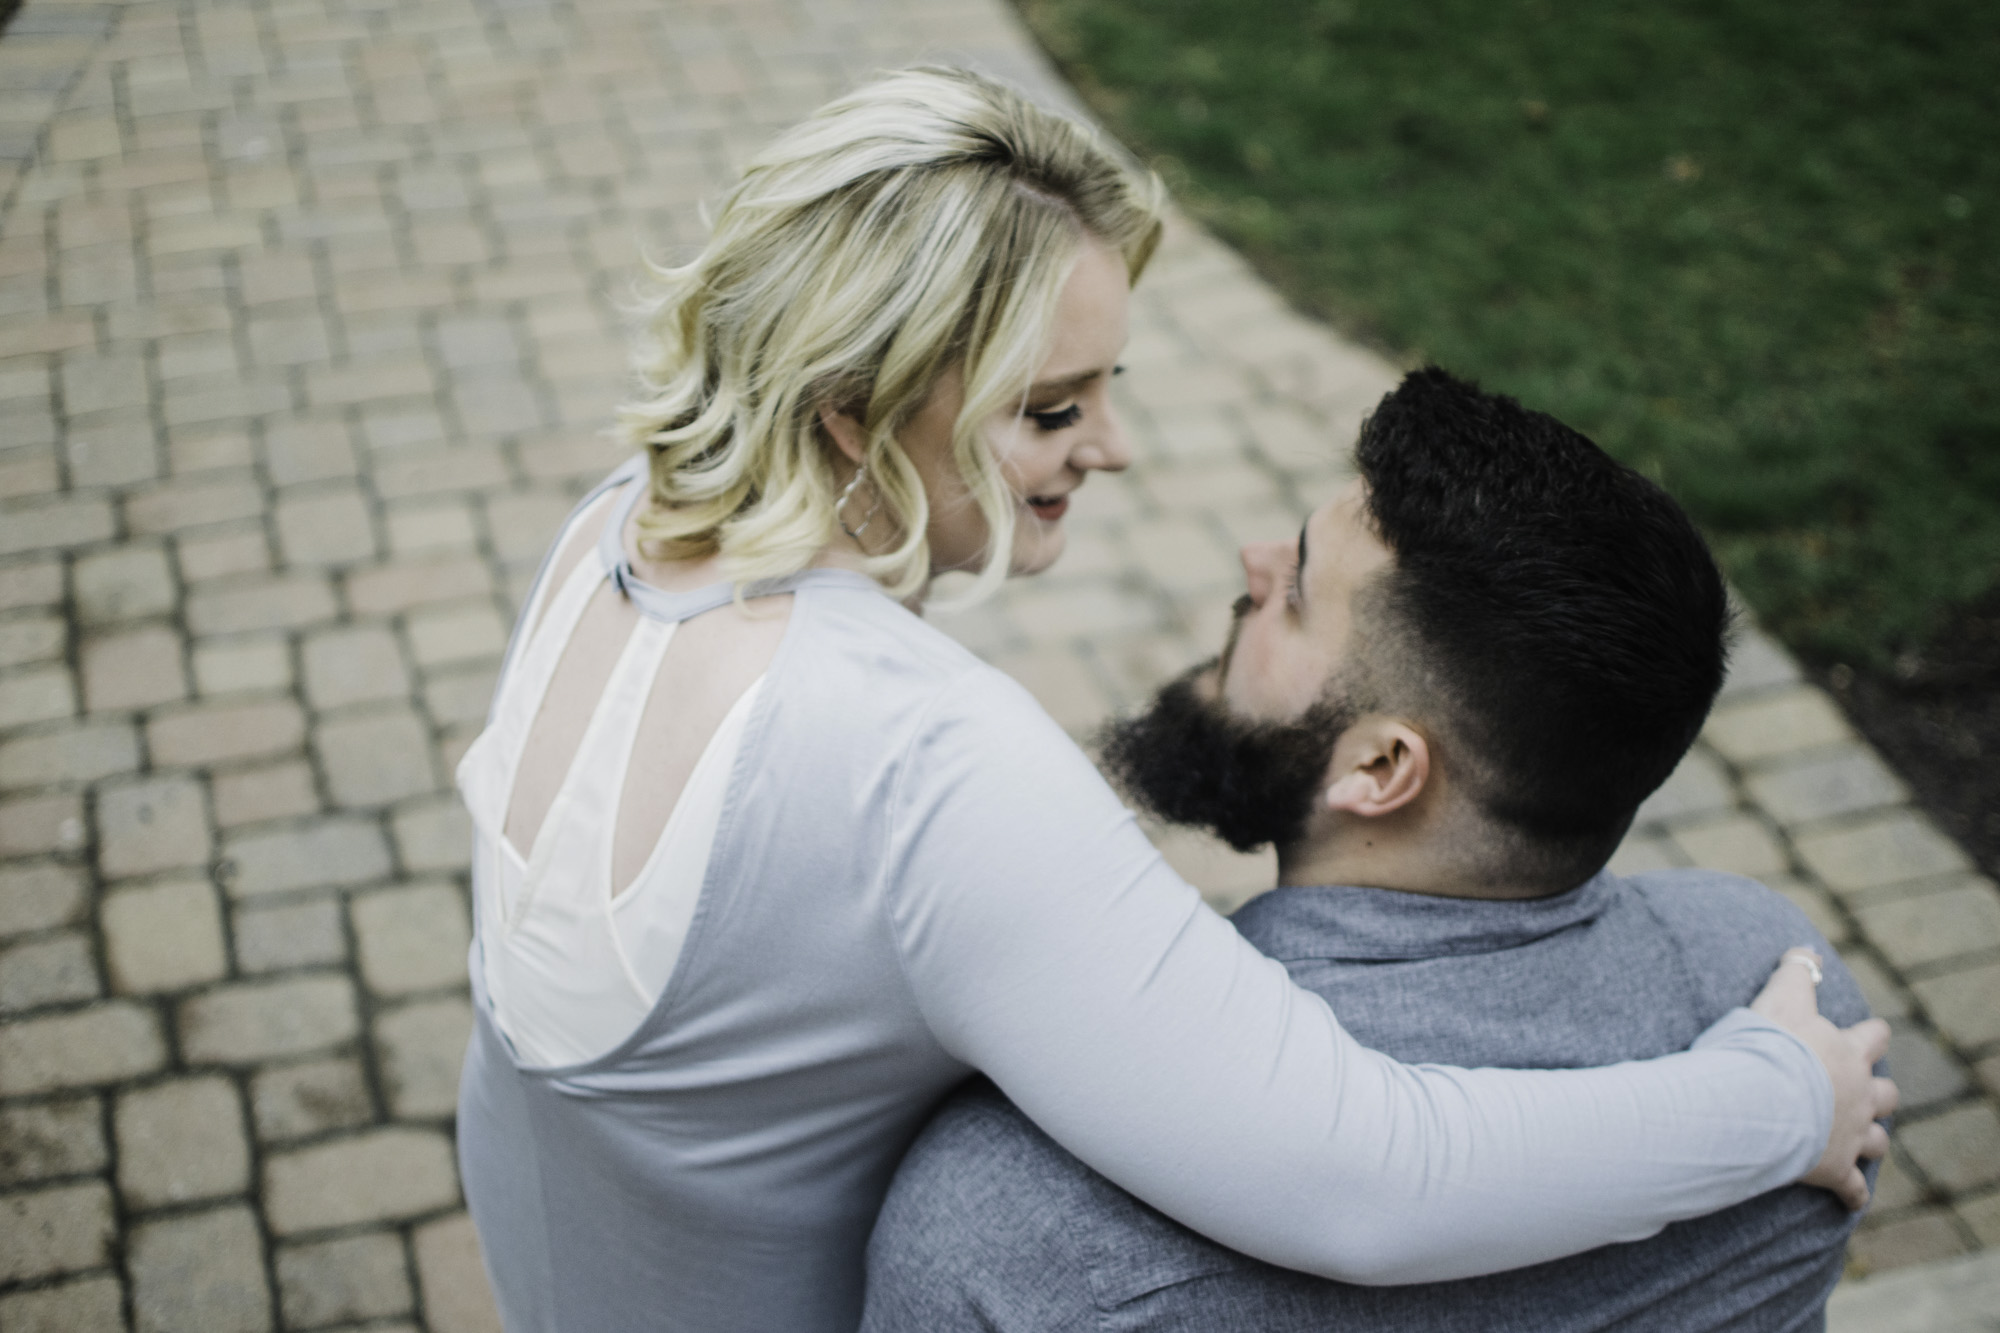 Cate_Ann_Photography_Dayton_Ohio_Wedding_And_Engagement_PhotographerDSC_2658.jpg